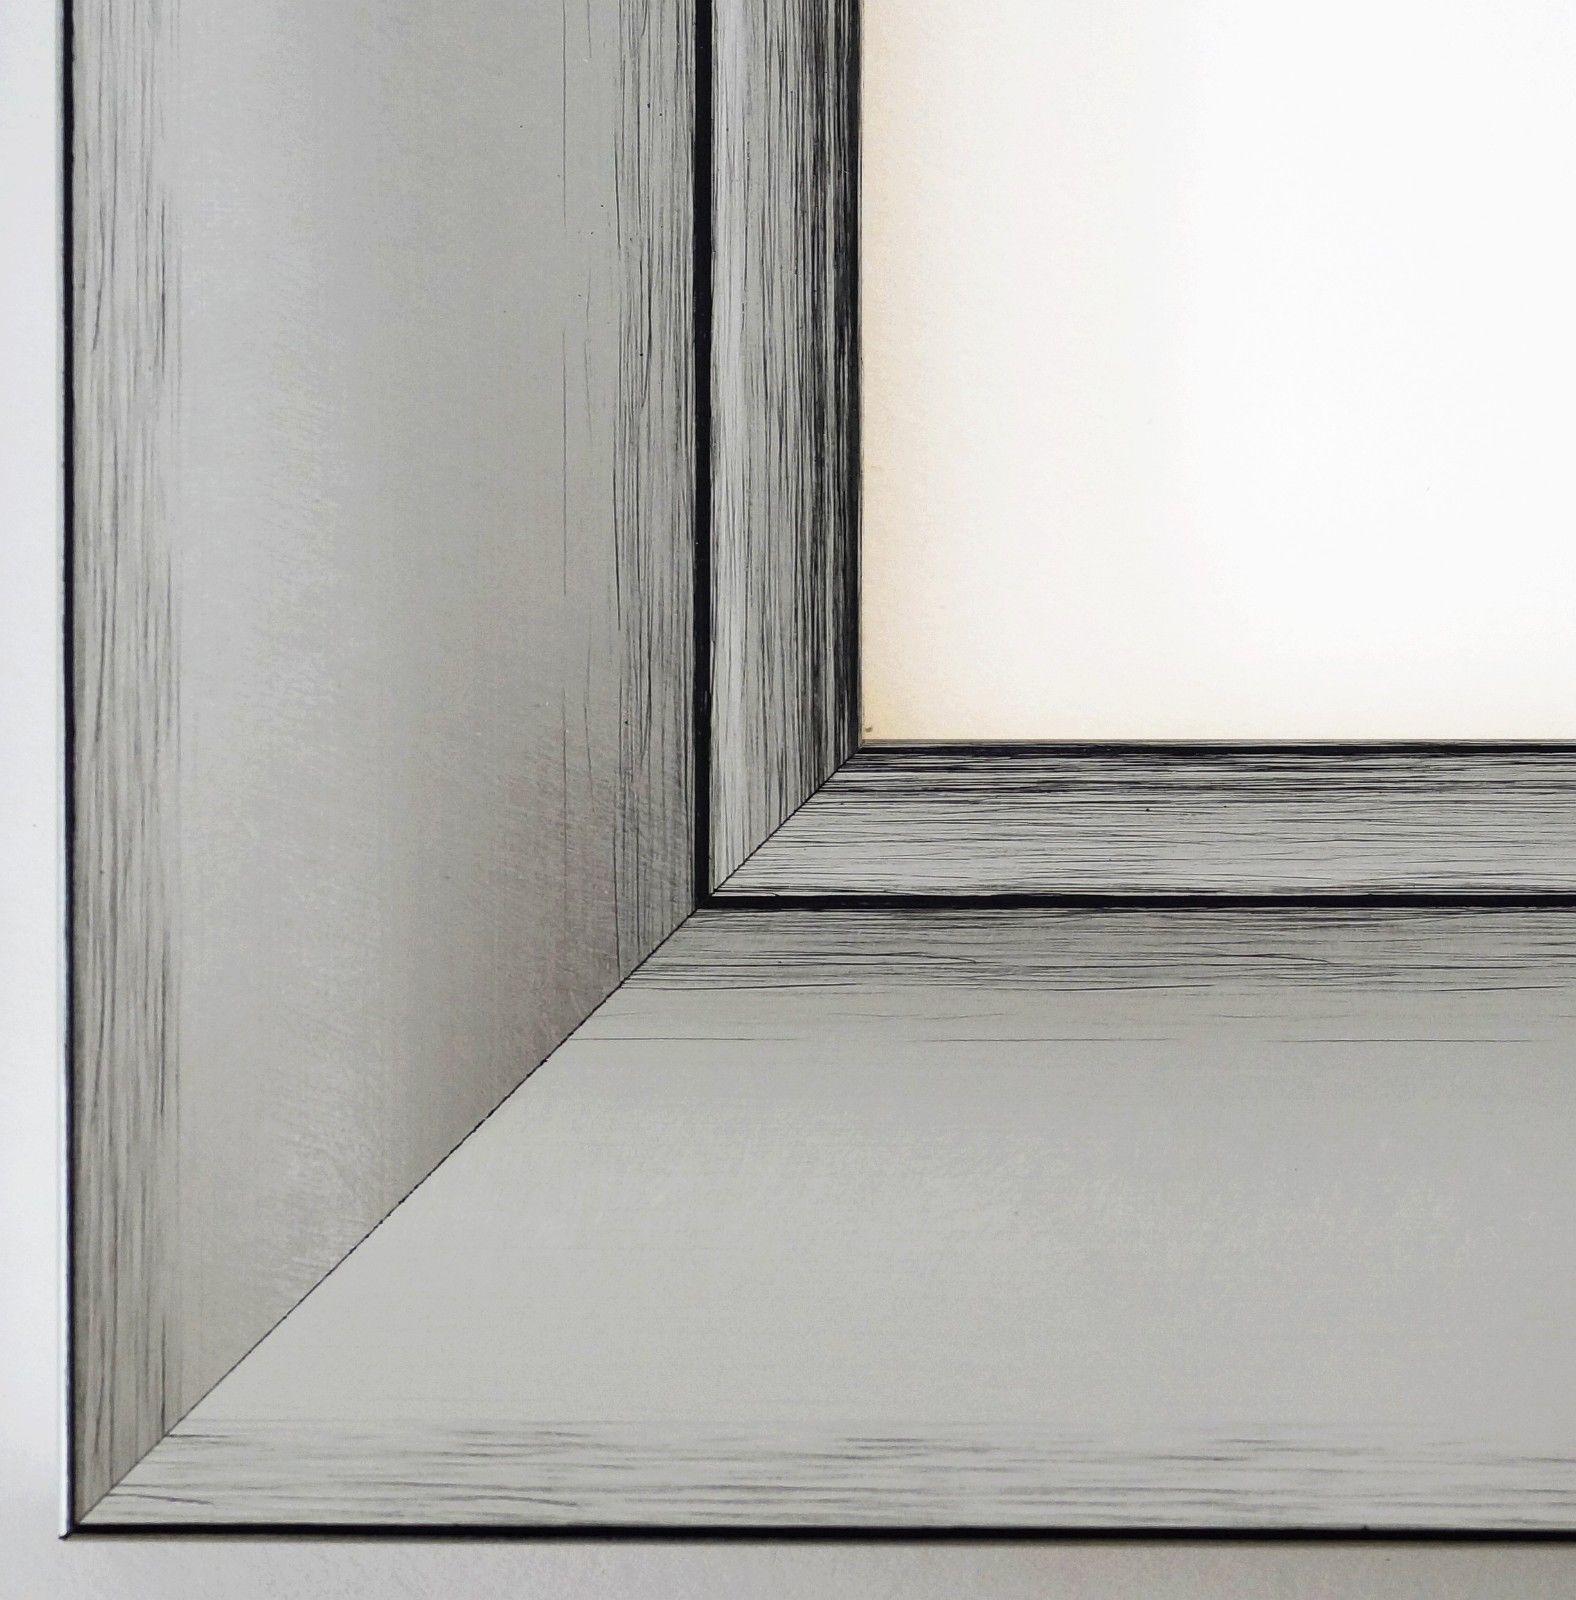 Bilderrahmen Silber Bochum 6, 9 - 9x13 10x10 10x15 13x18 15x20 18x24 ...